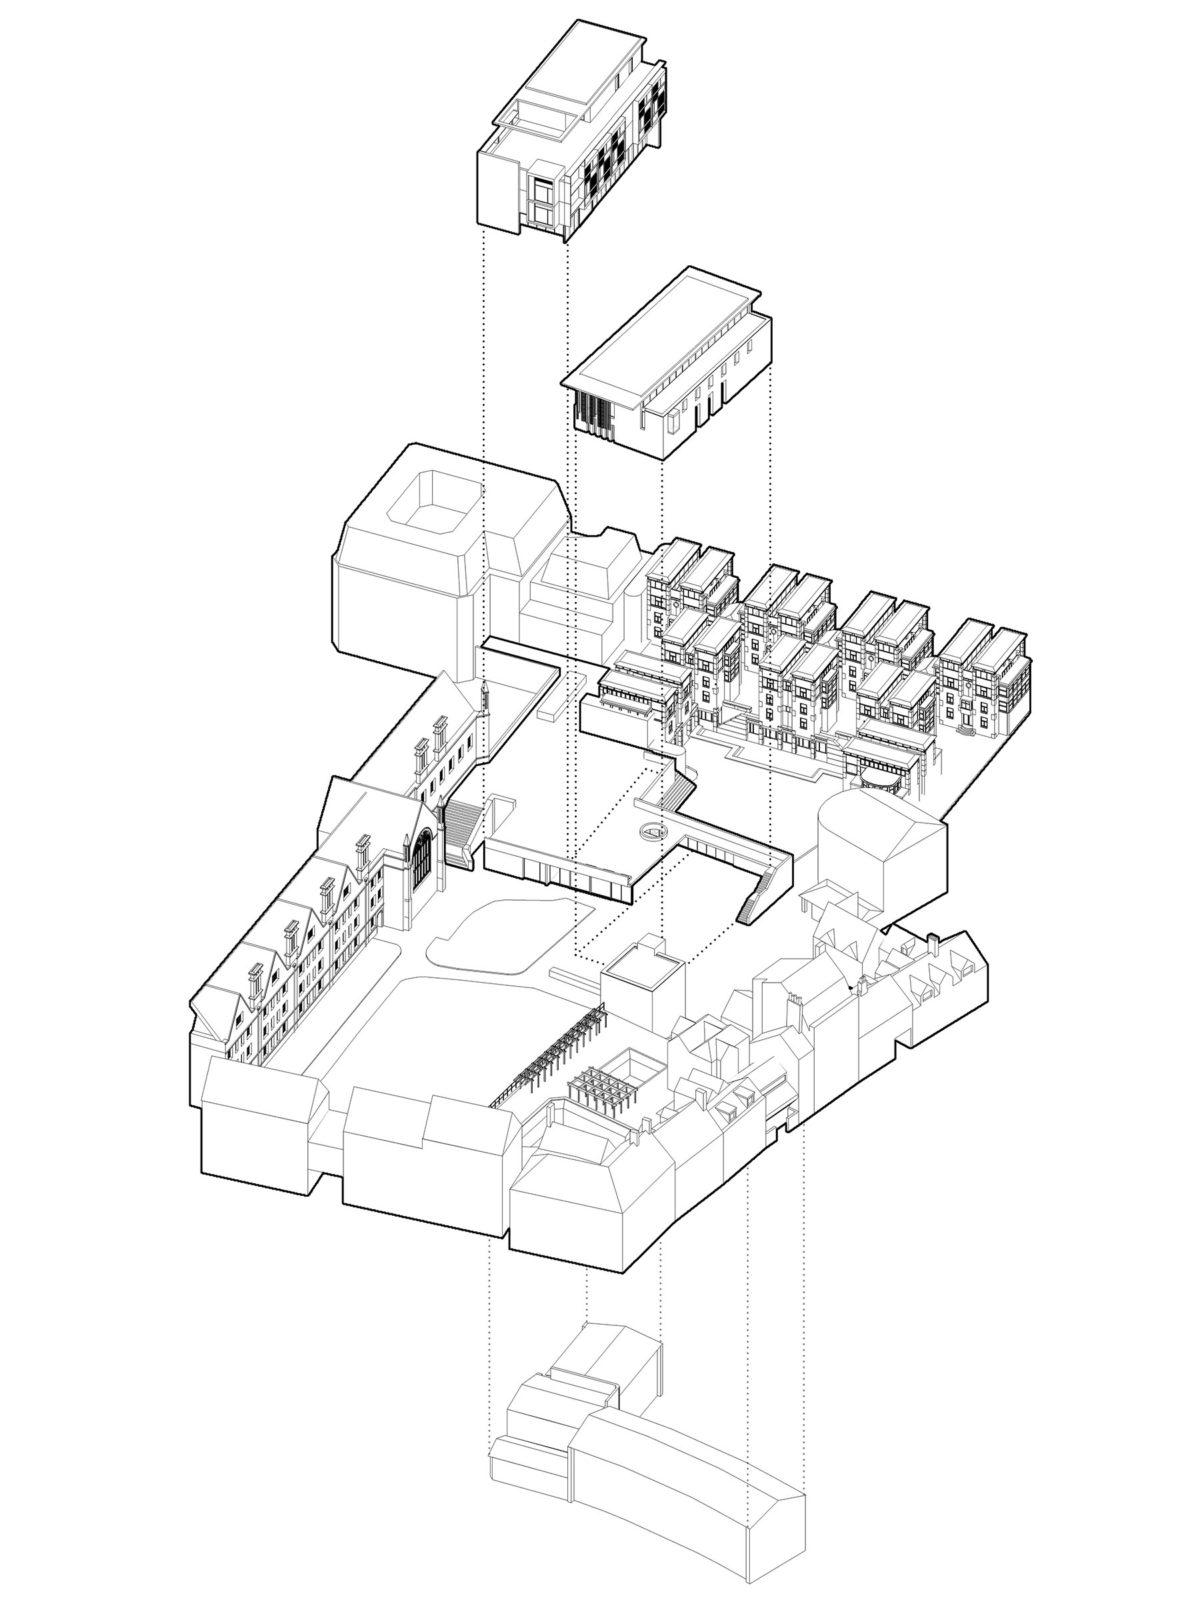 DesignEngine Wadham College Visualisation Axonometric